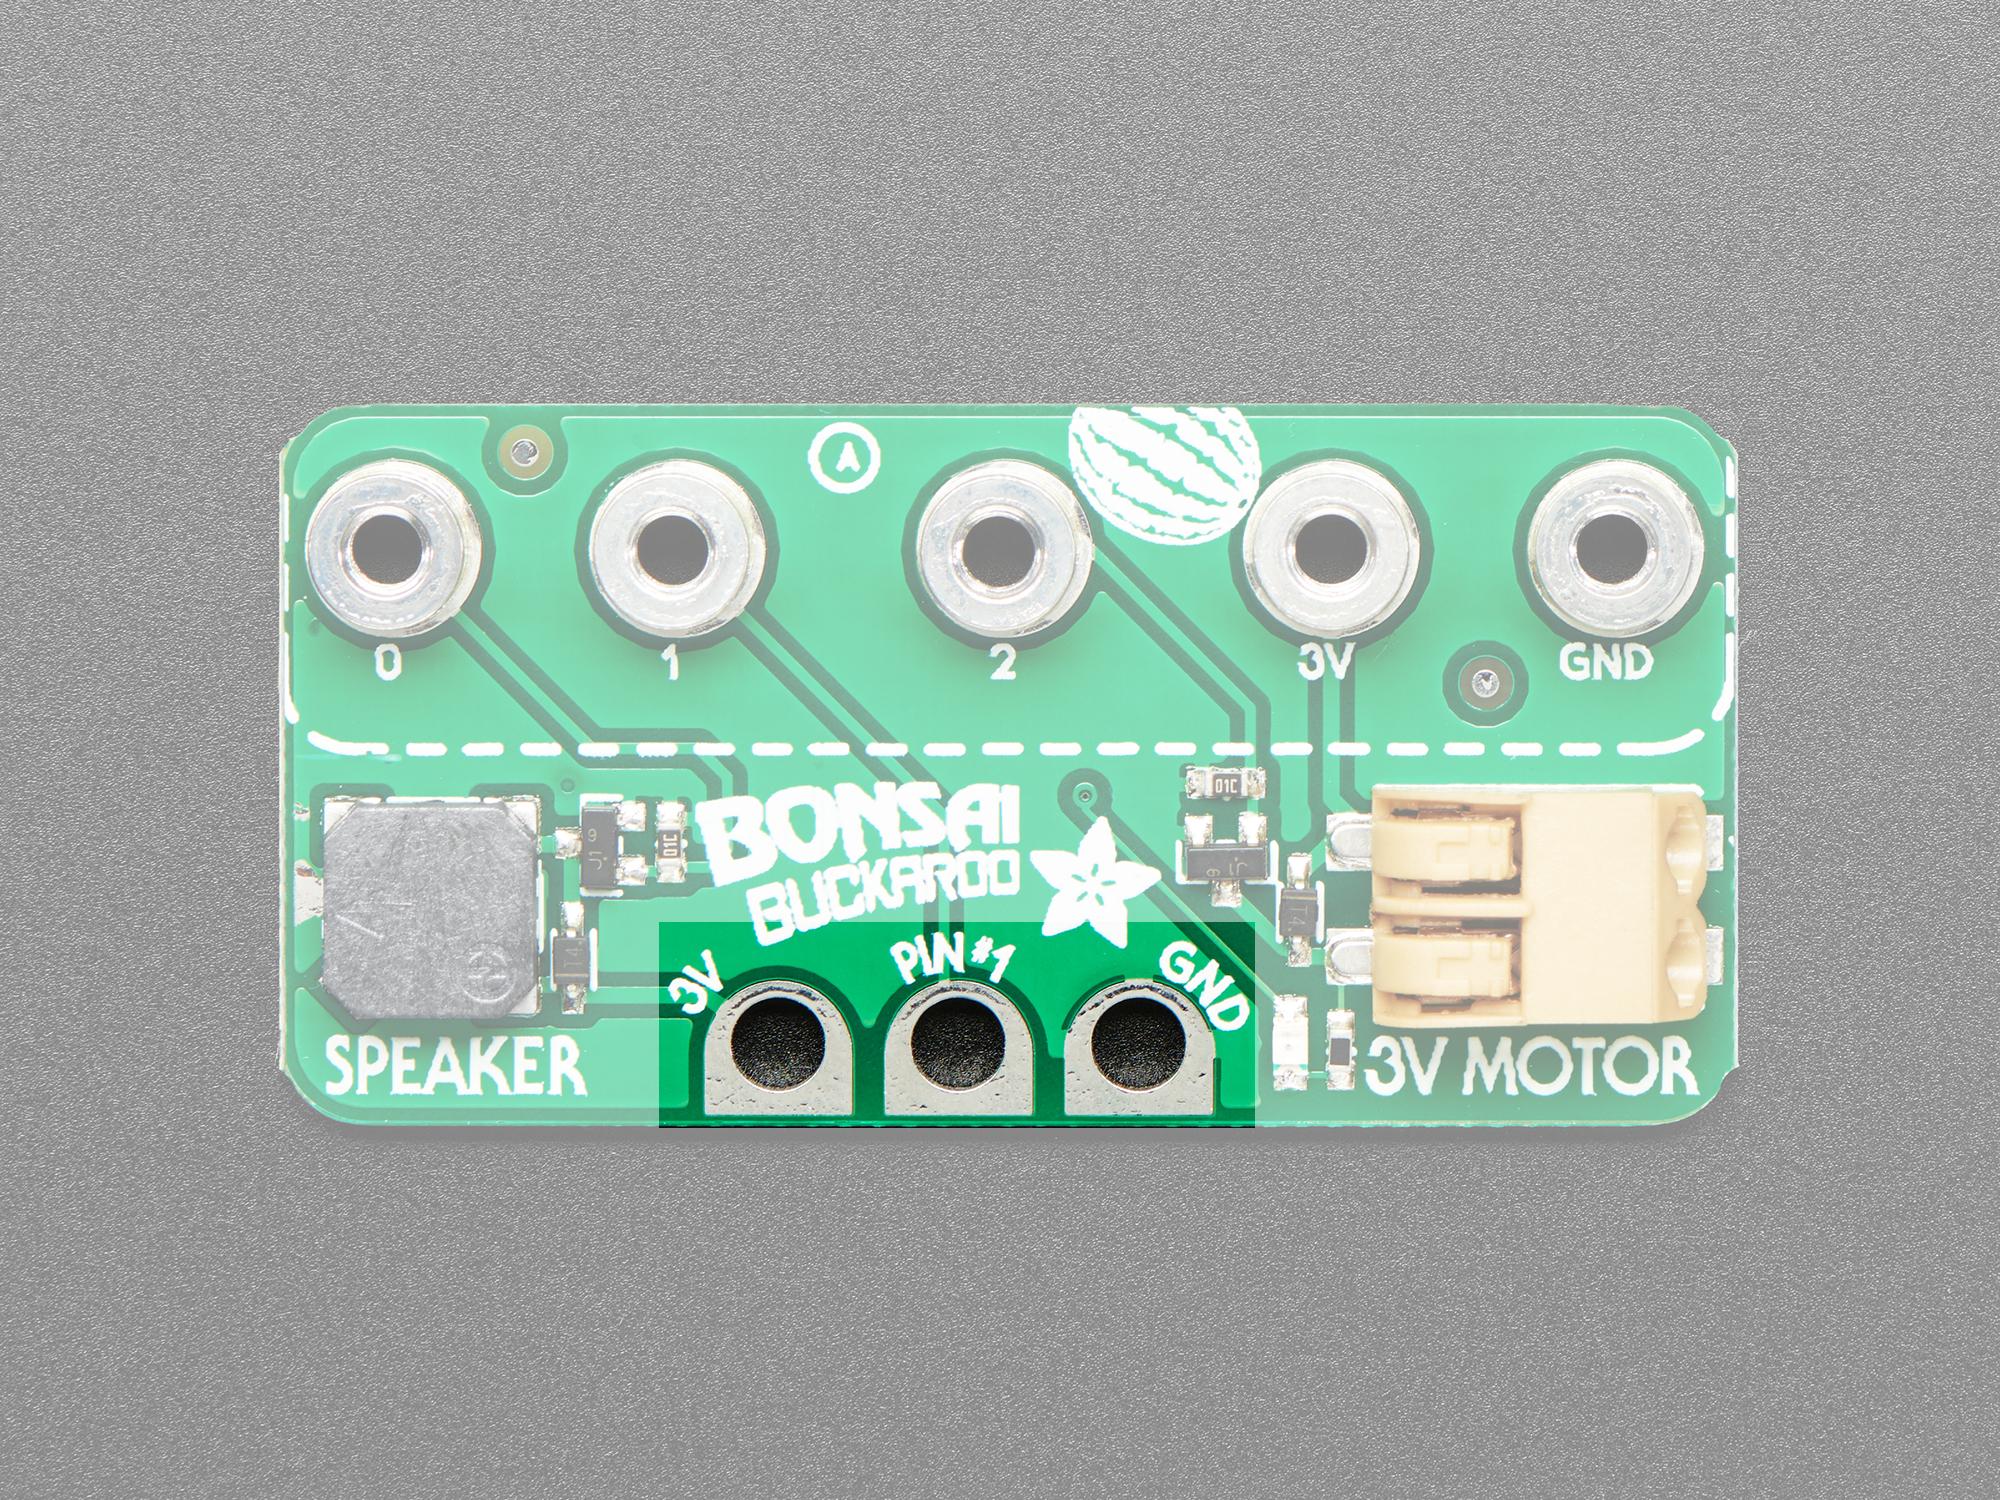 sensors_BB_pinouts_pins.jpg